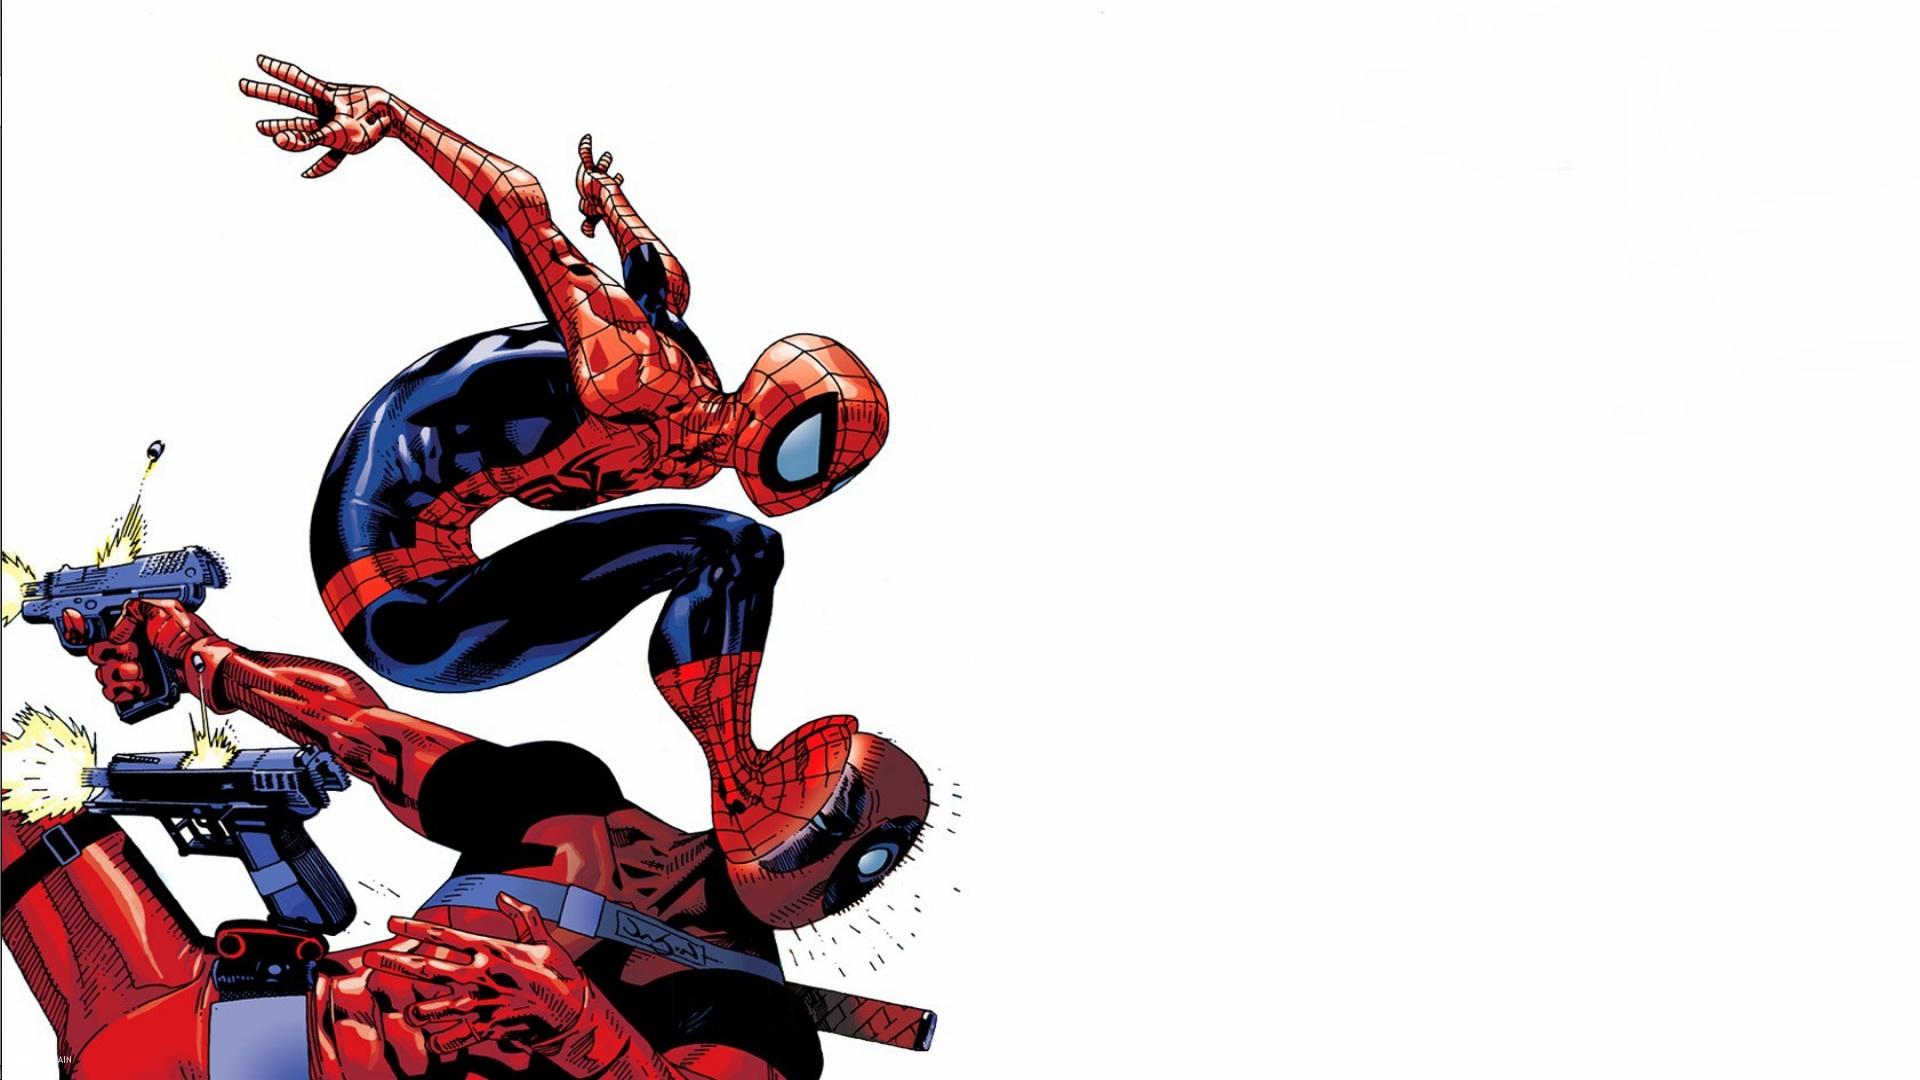 General 1920x1080 artwork Spider-Man comic art simple background gun weapon Deadpool